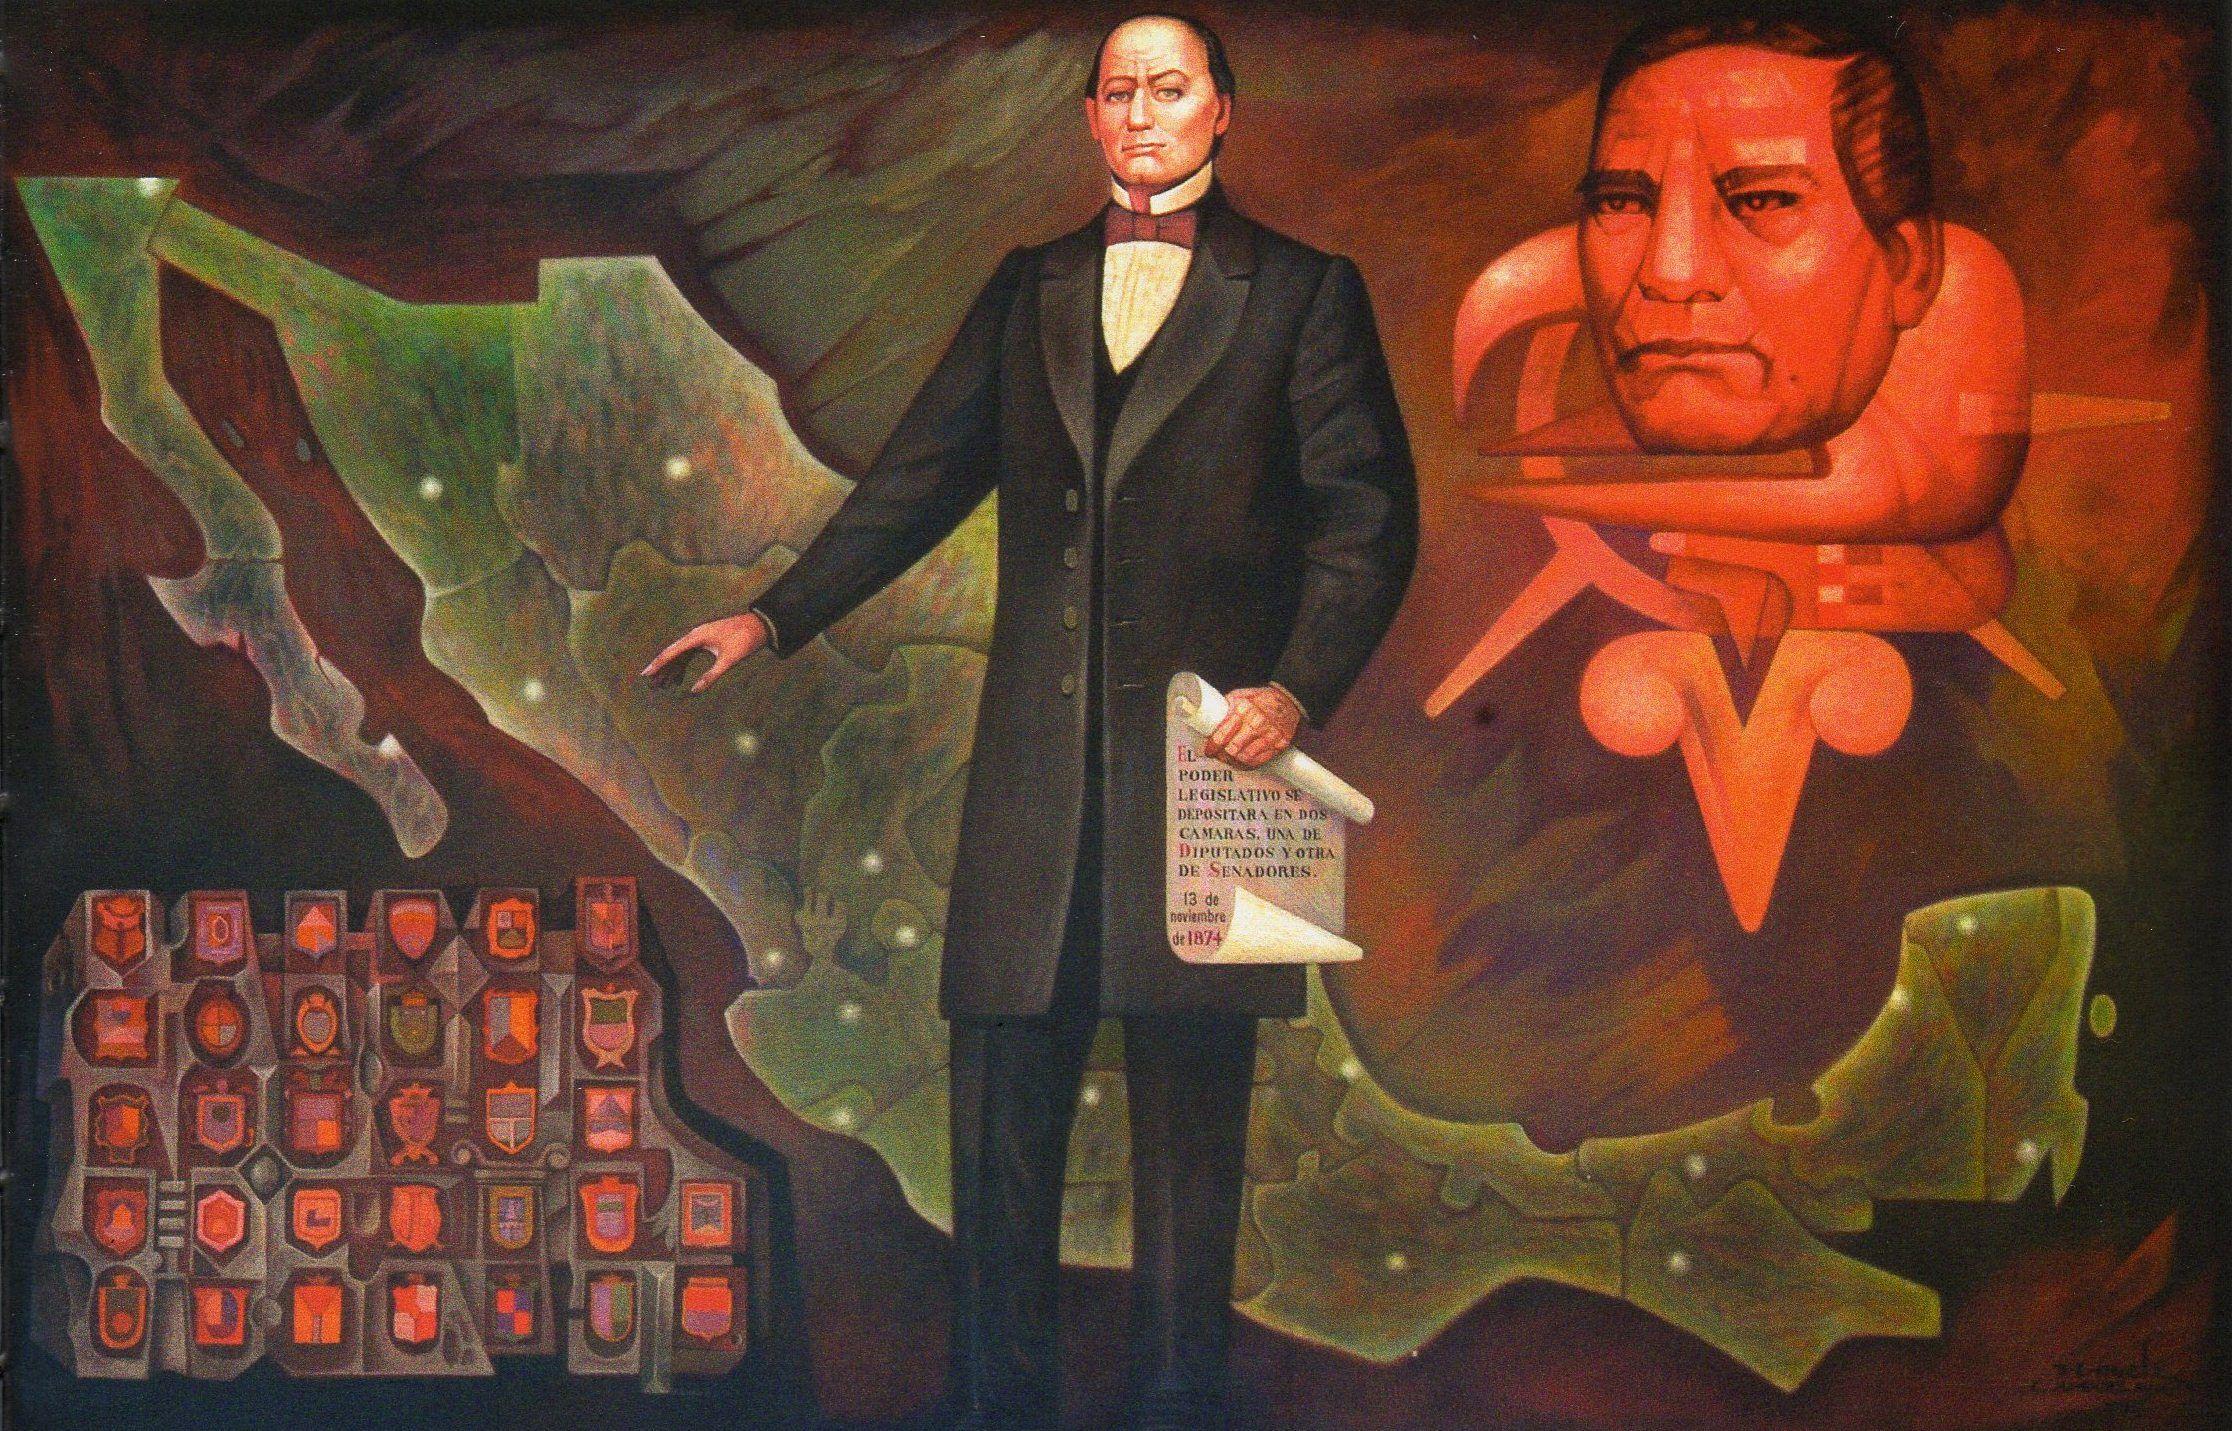 Mural autores de la restauraci n del senado antigua for Benito juarez mural